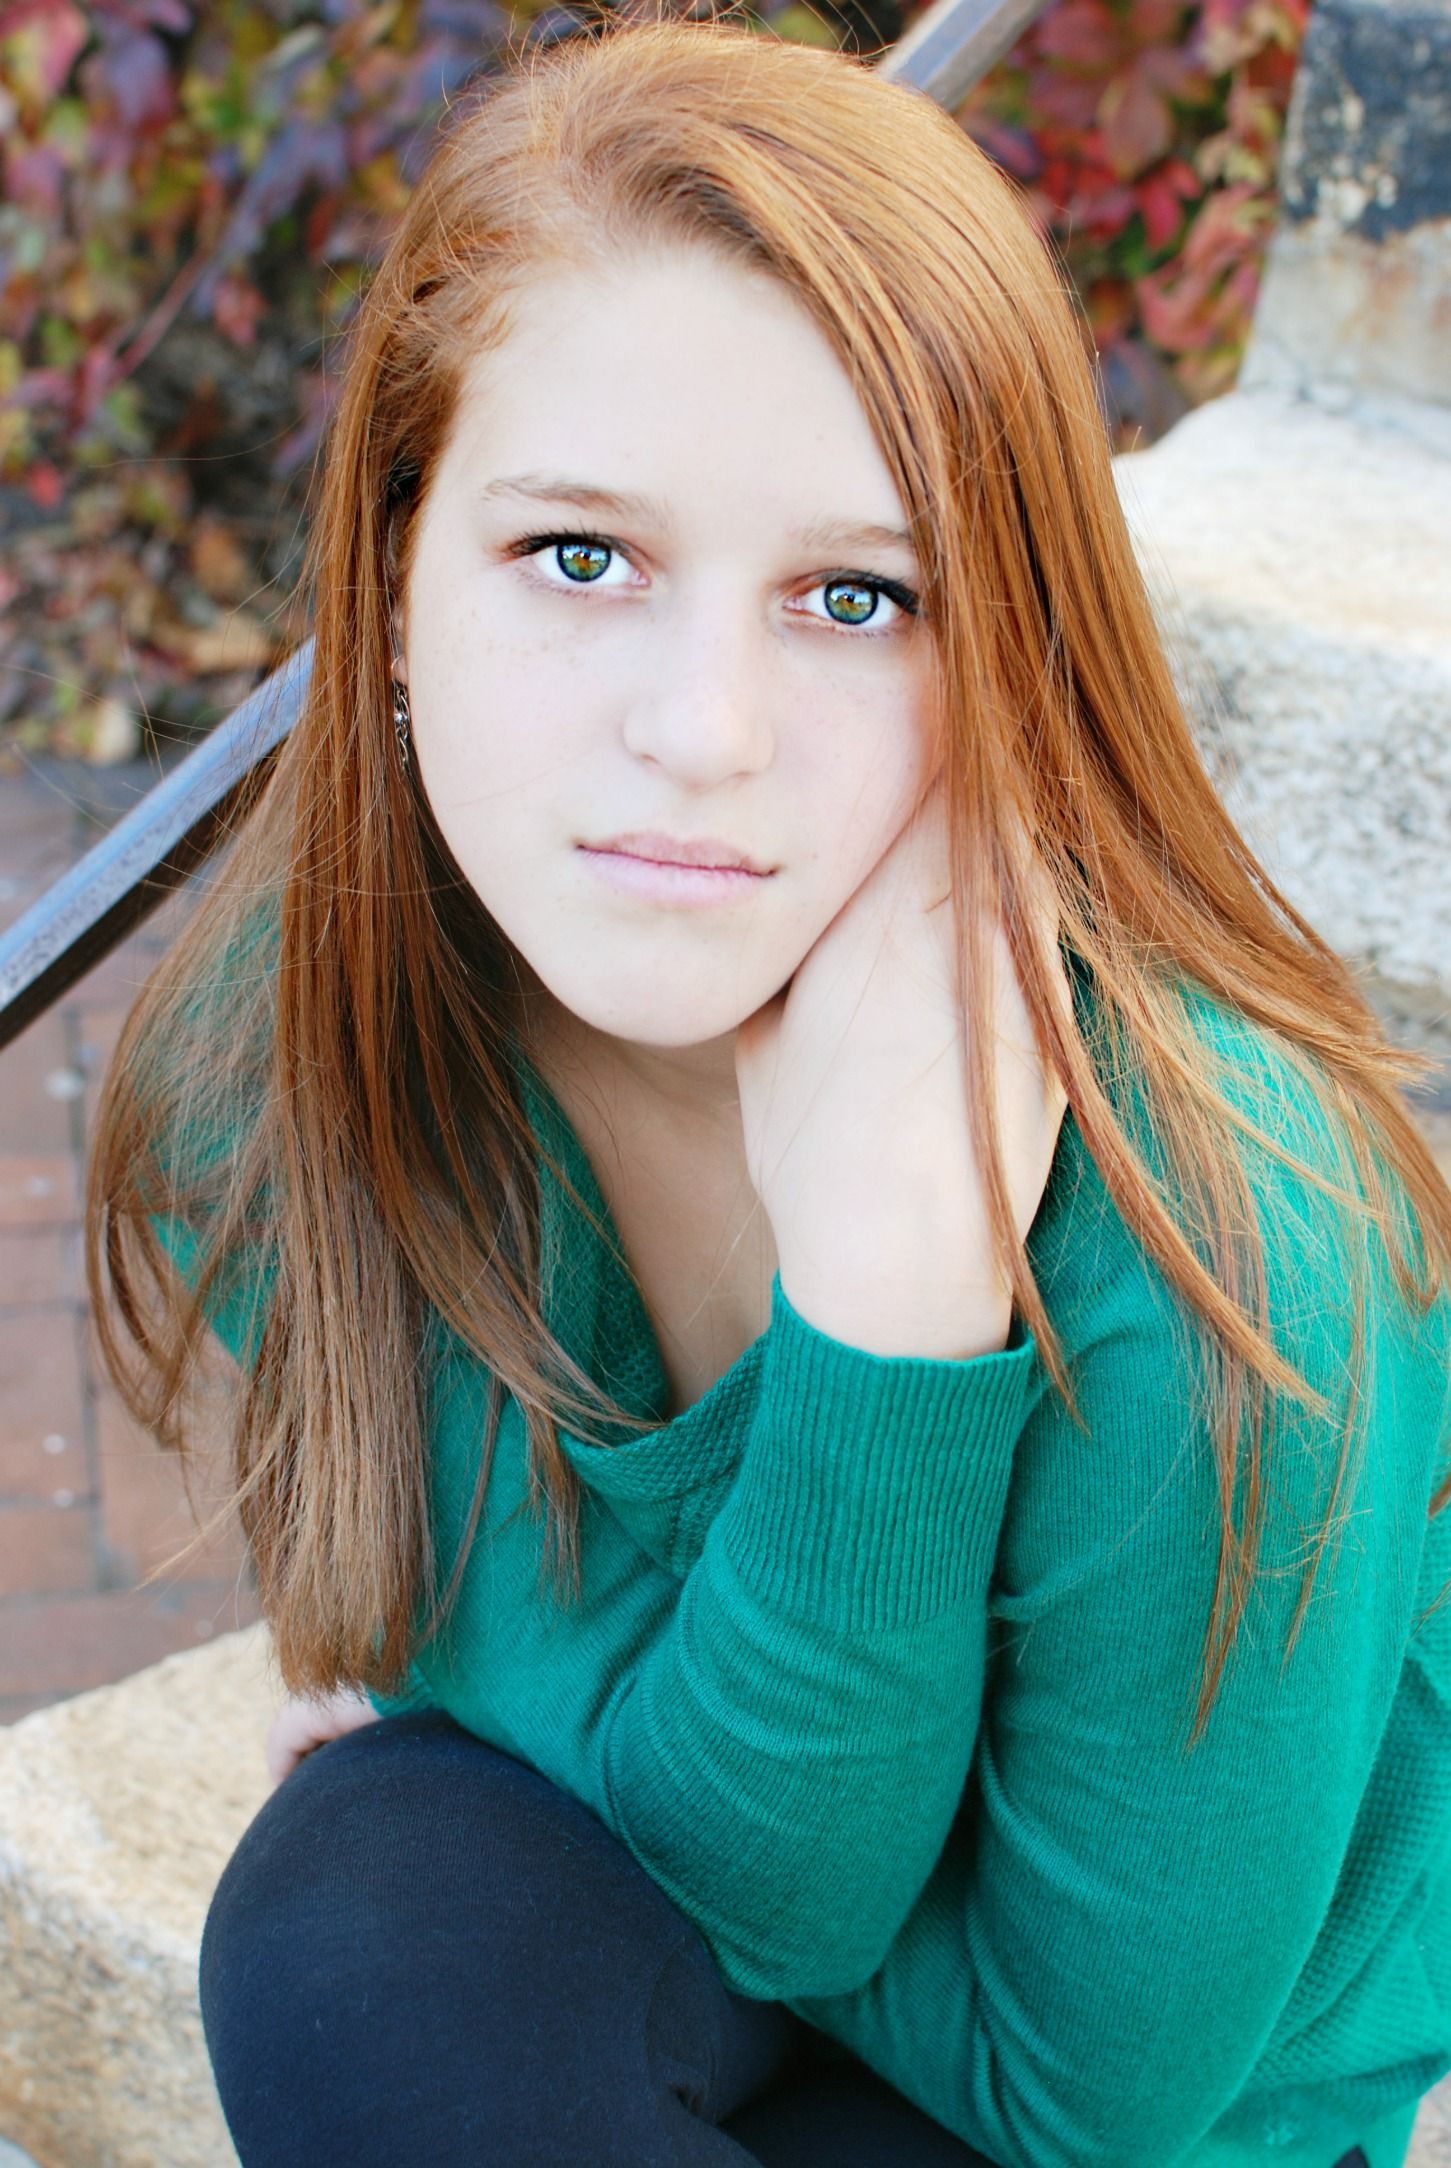 Teen redheads posing